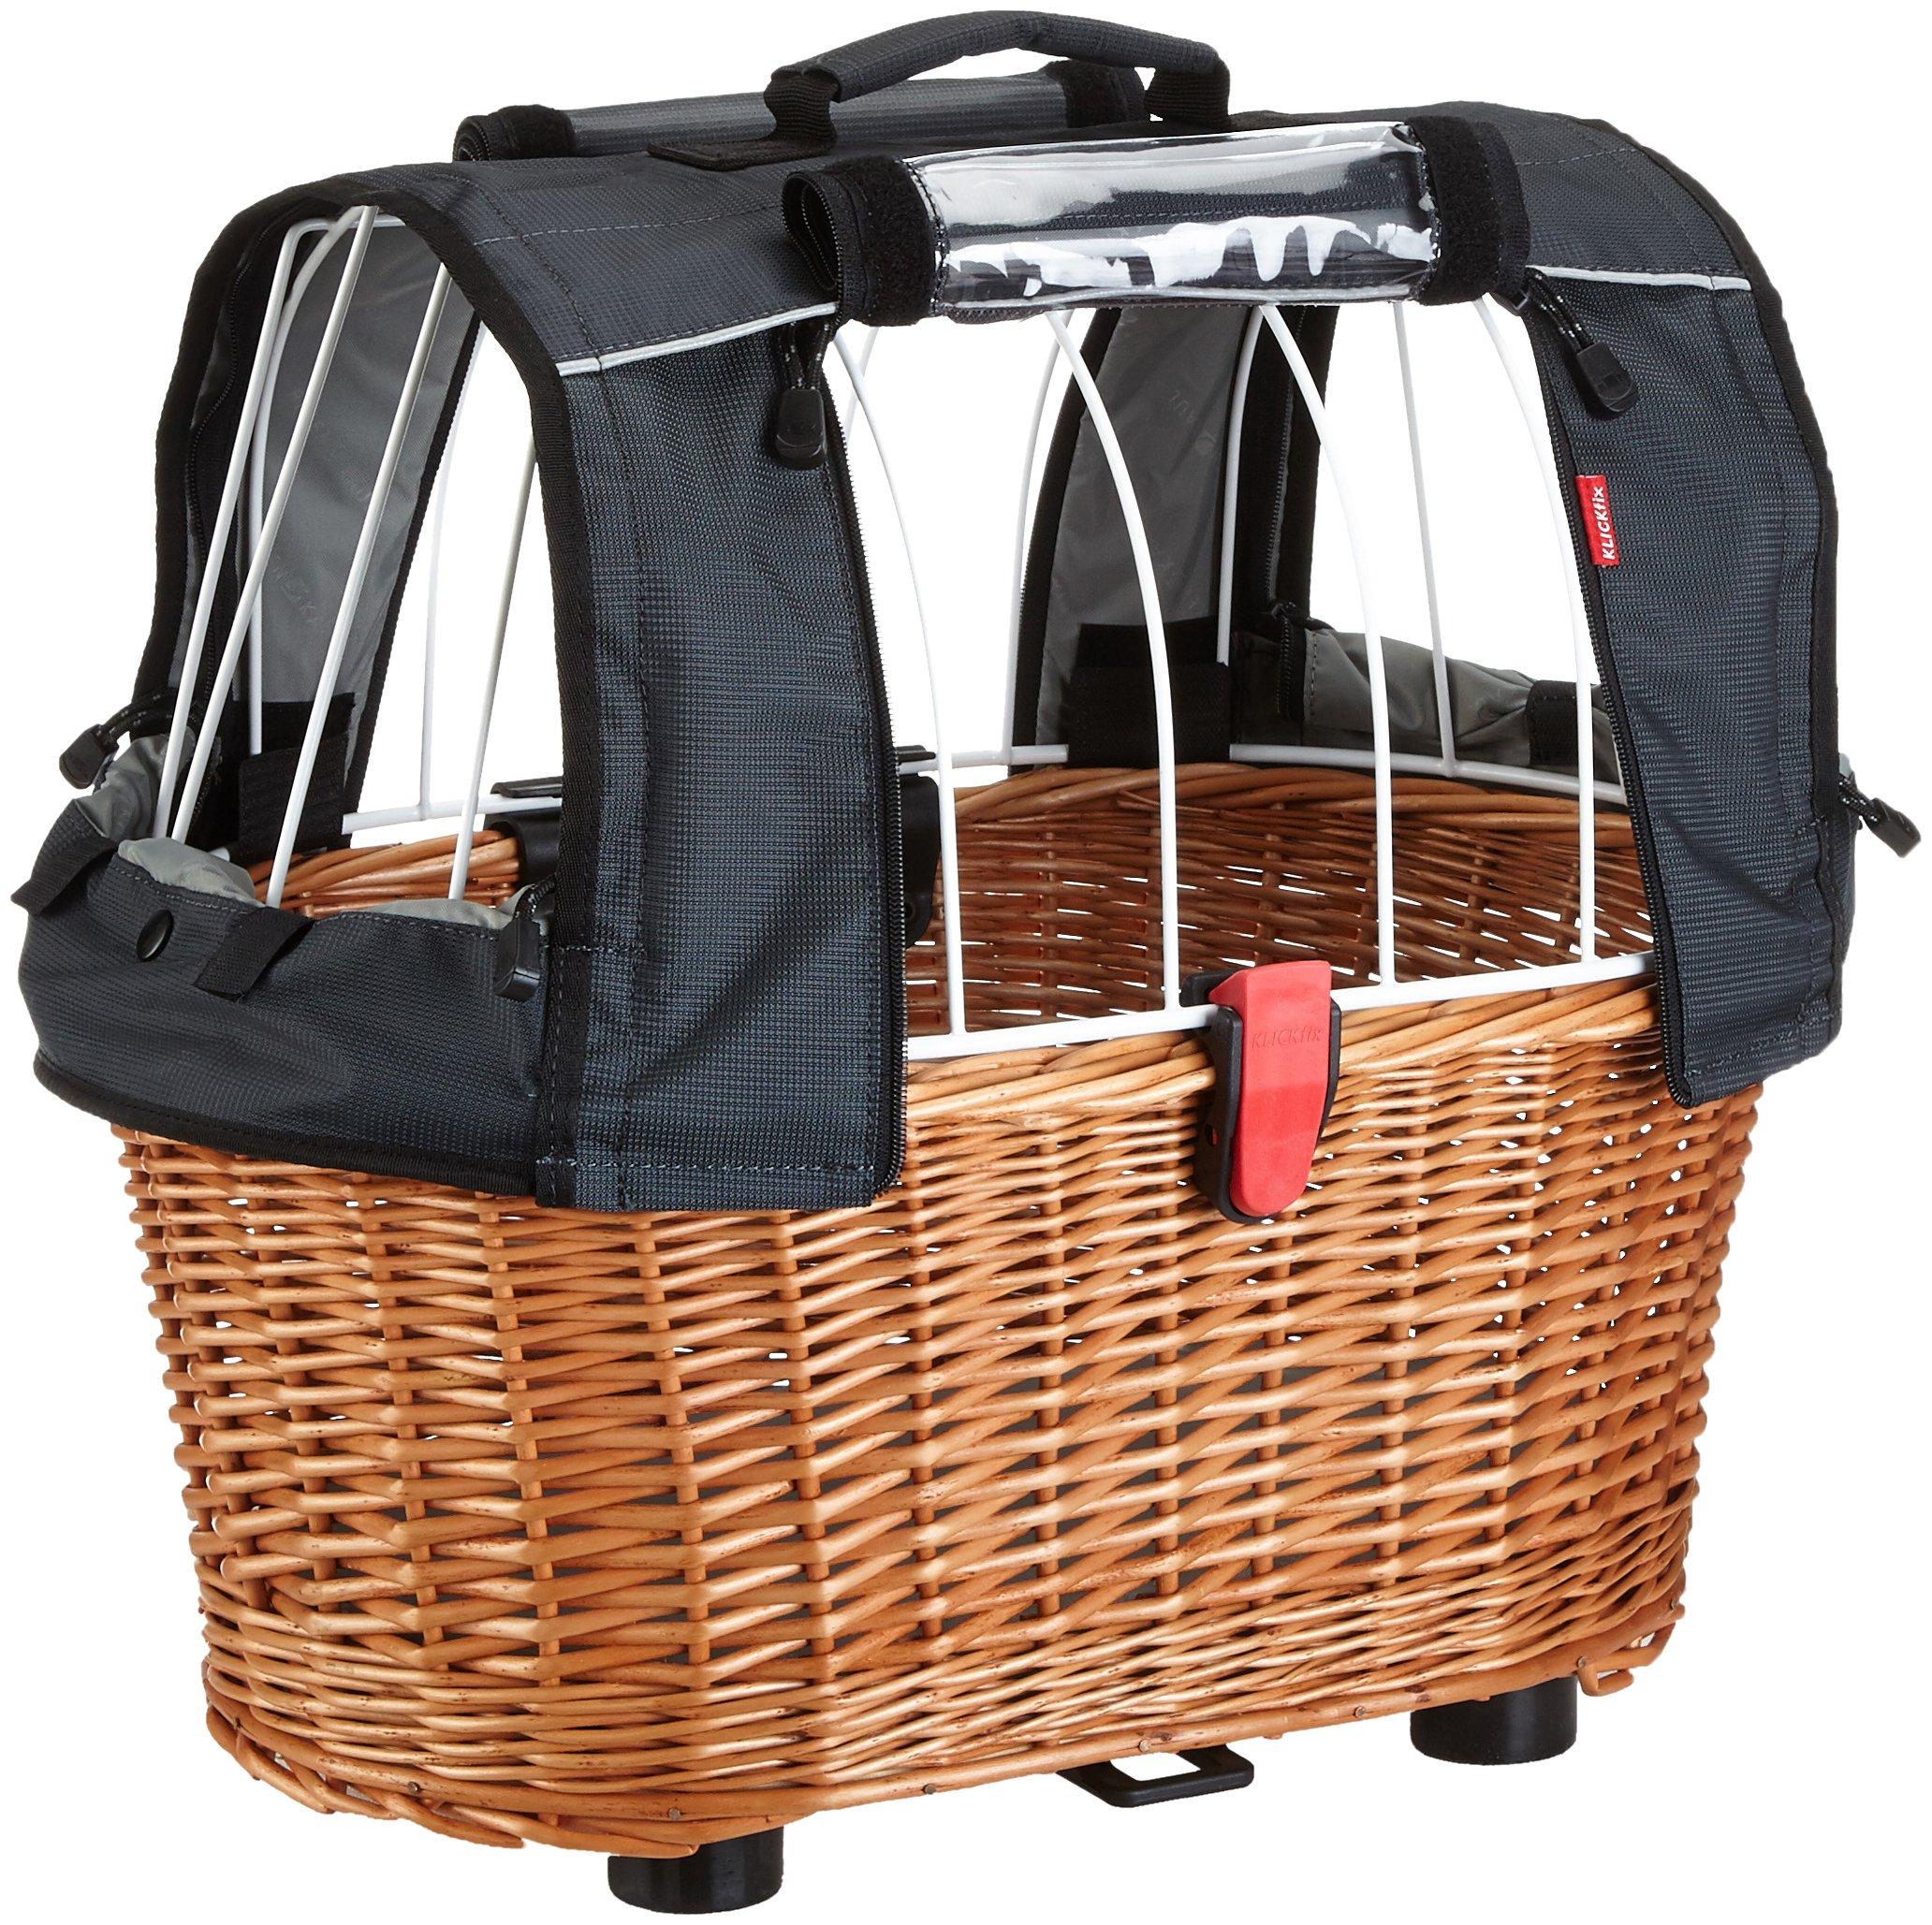 KlickFix rear basket Rixen & Kaul Doggy Basket Plus GTA by KlickFix (Image #2)